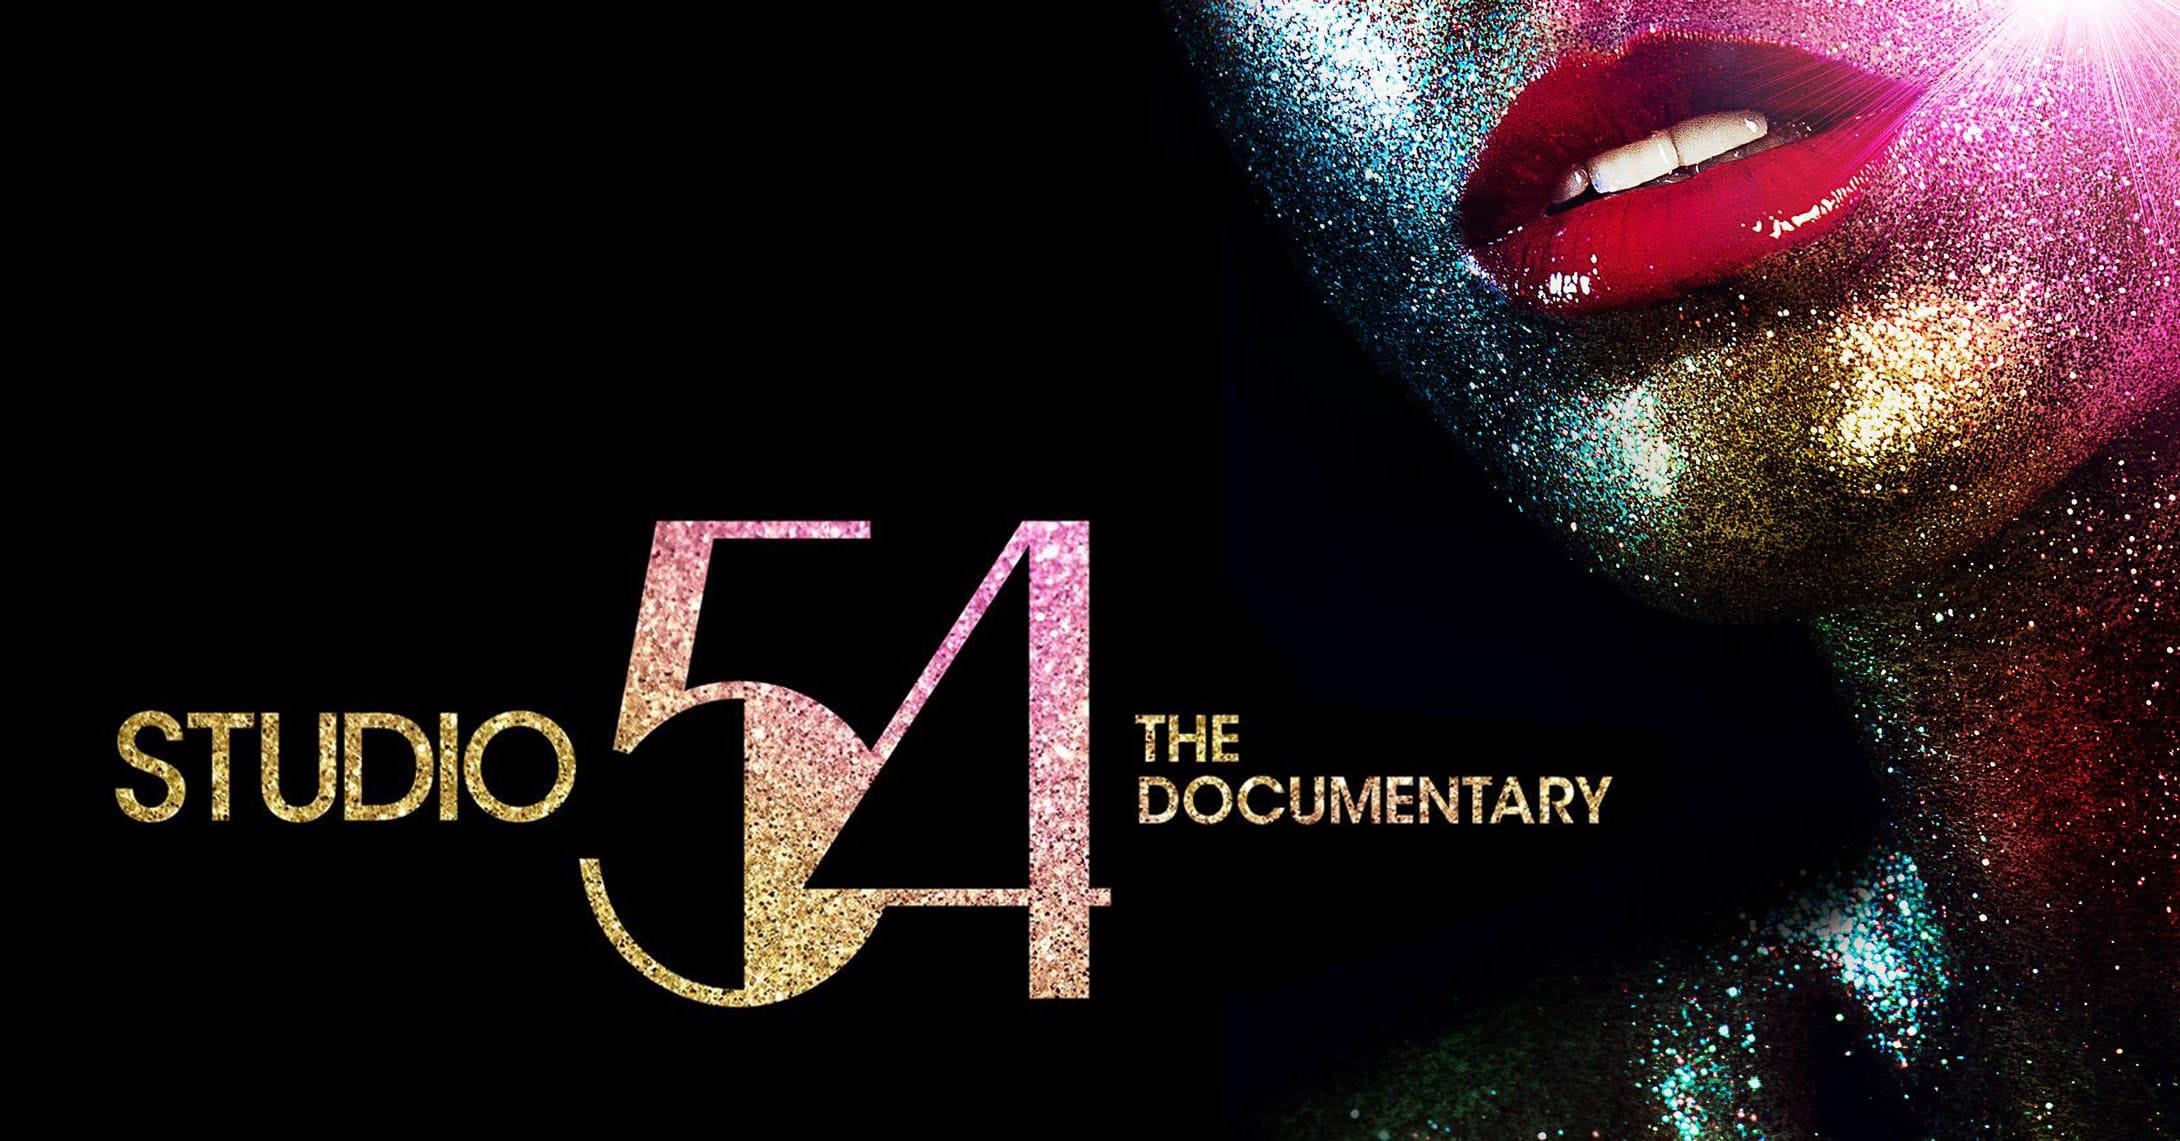 Monday 27.05.19 – 9:30pm: Open-Air Cinema | Studio 54